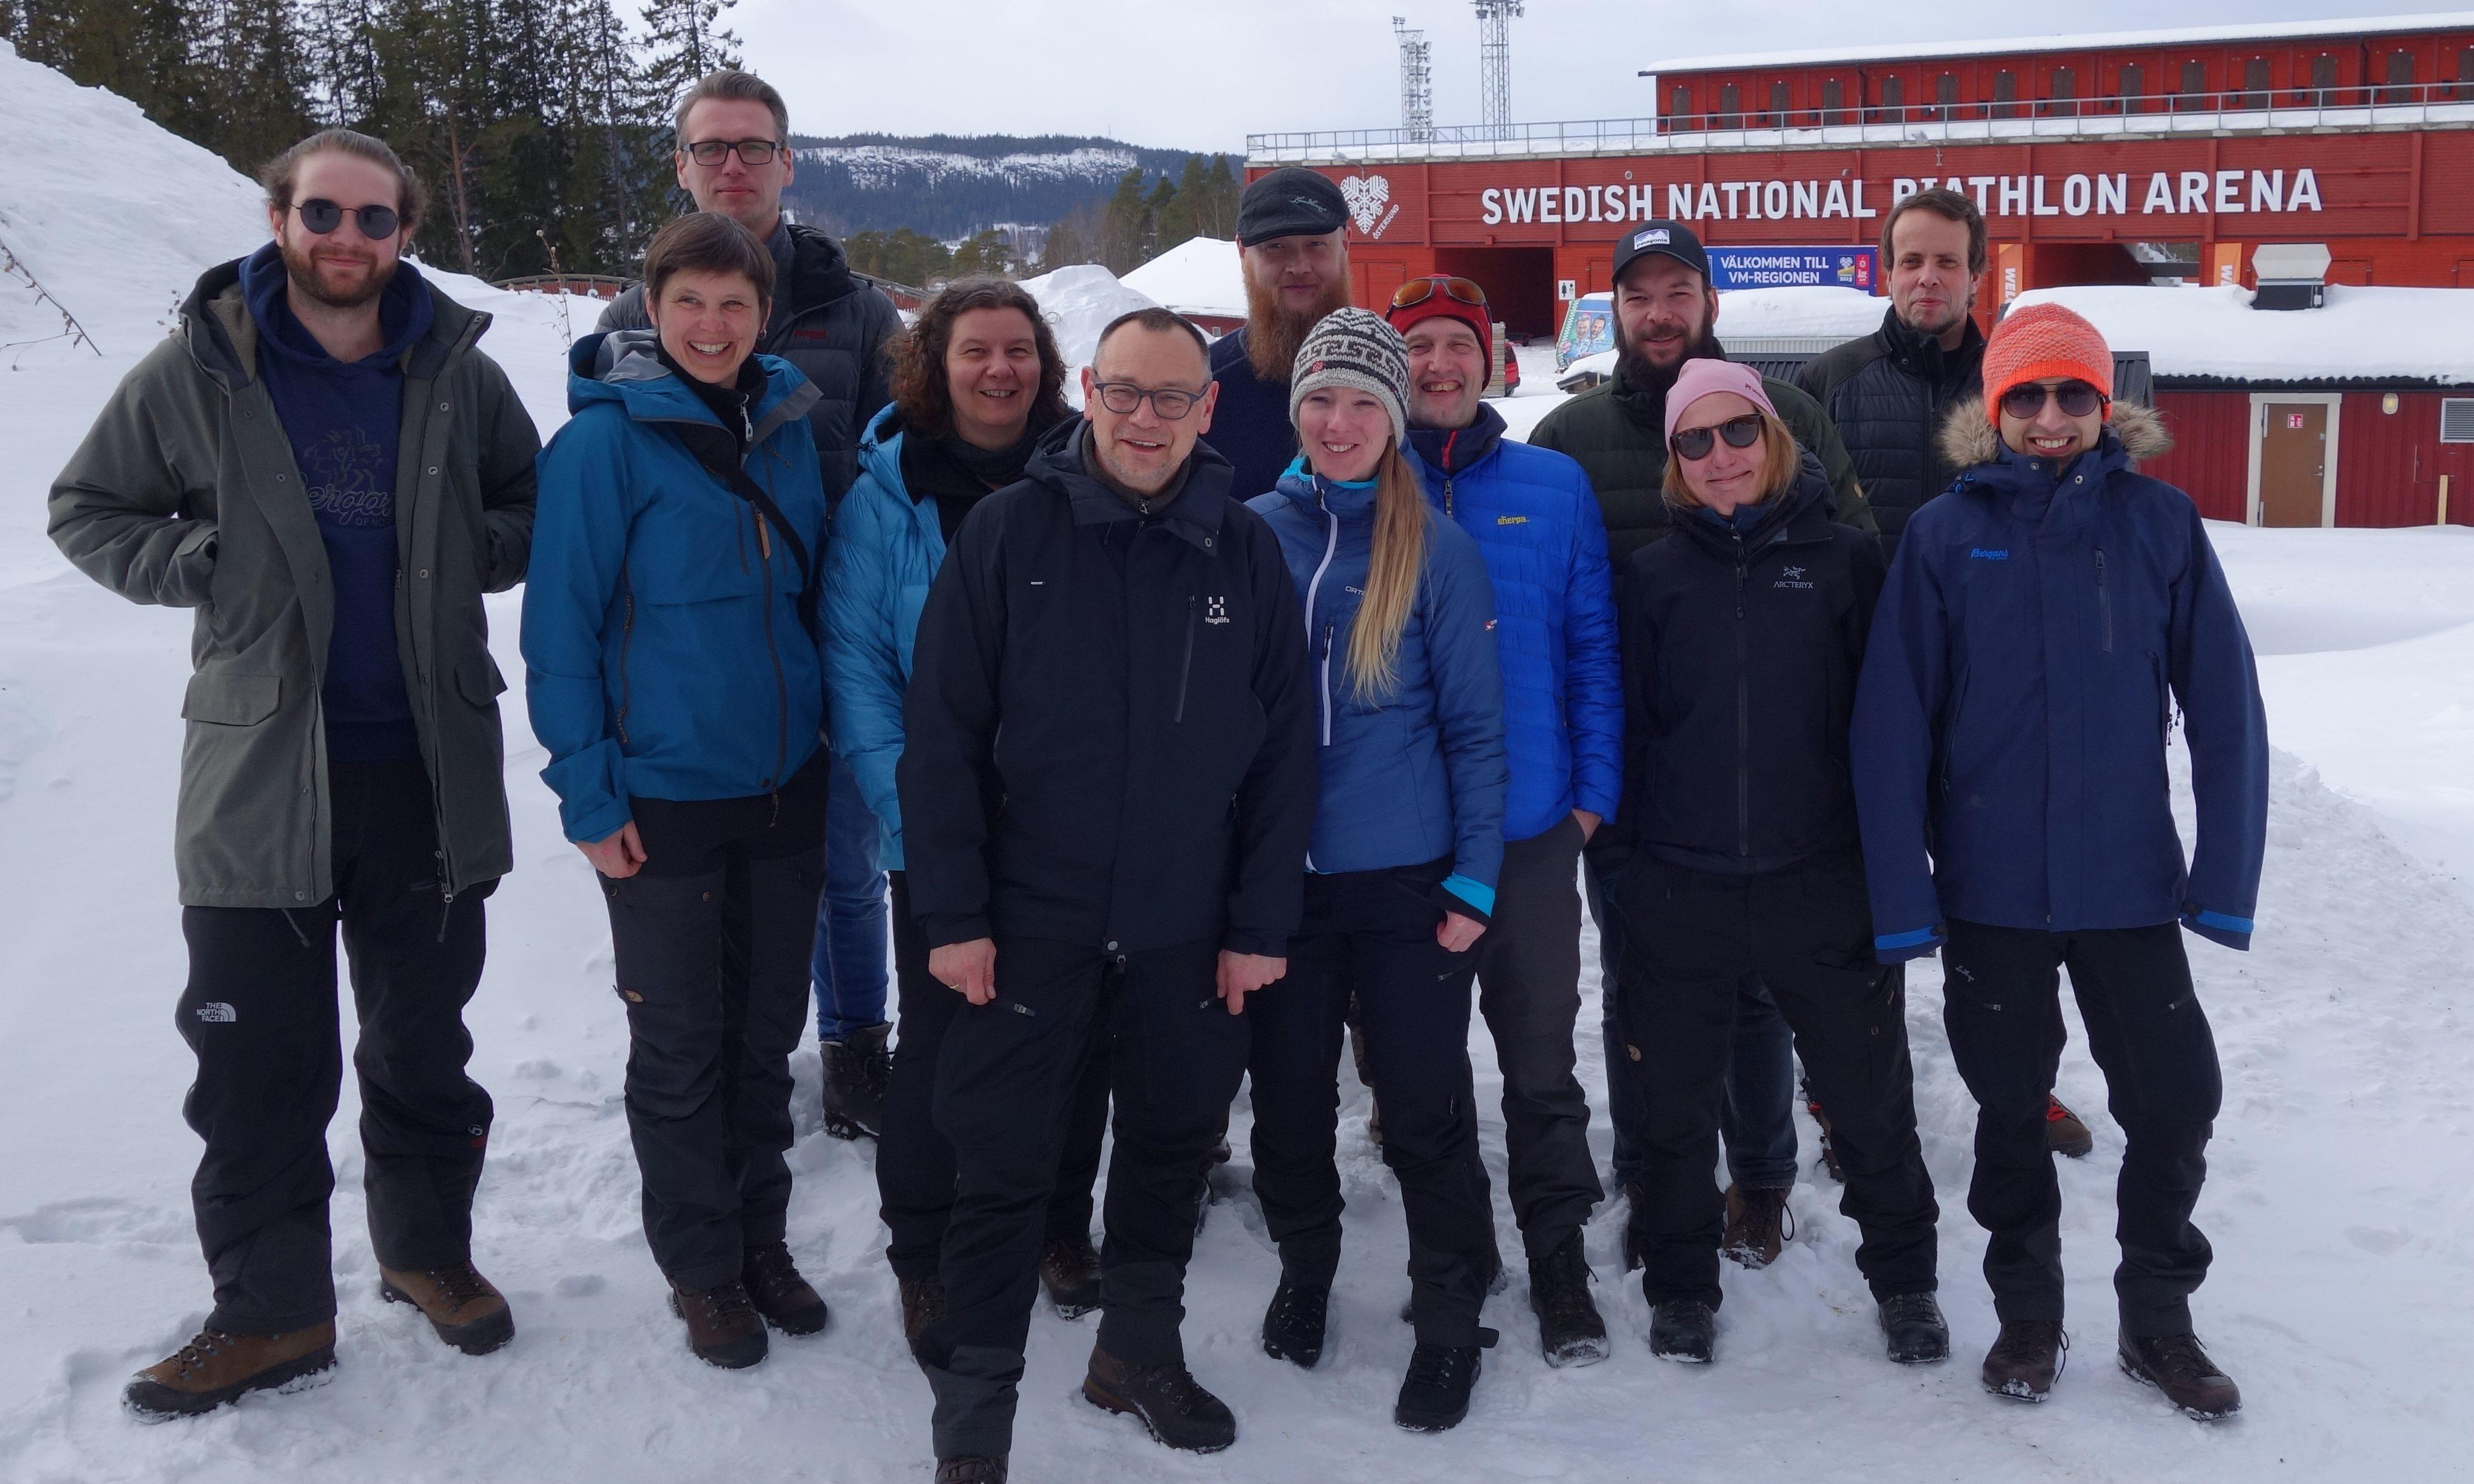 Unterwegs Gruppenbild in Schweden